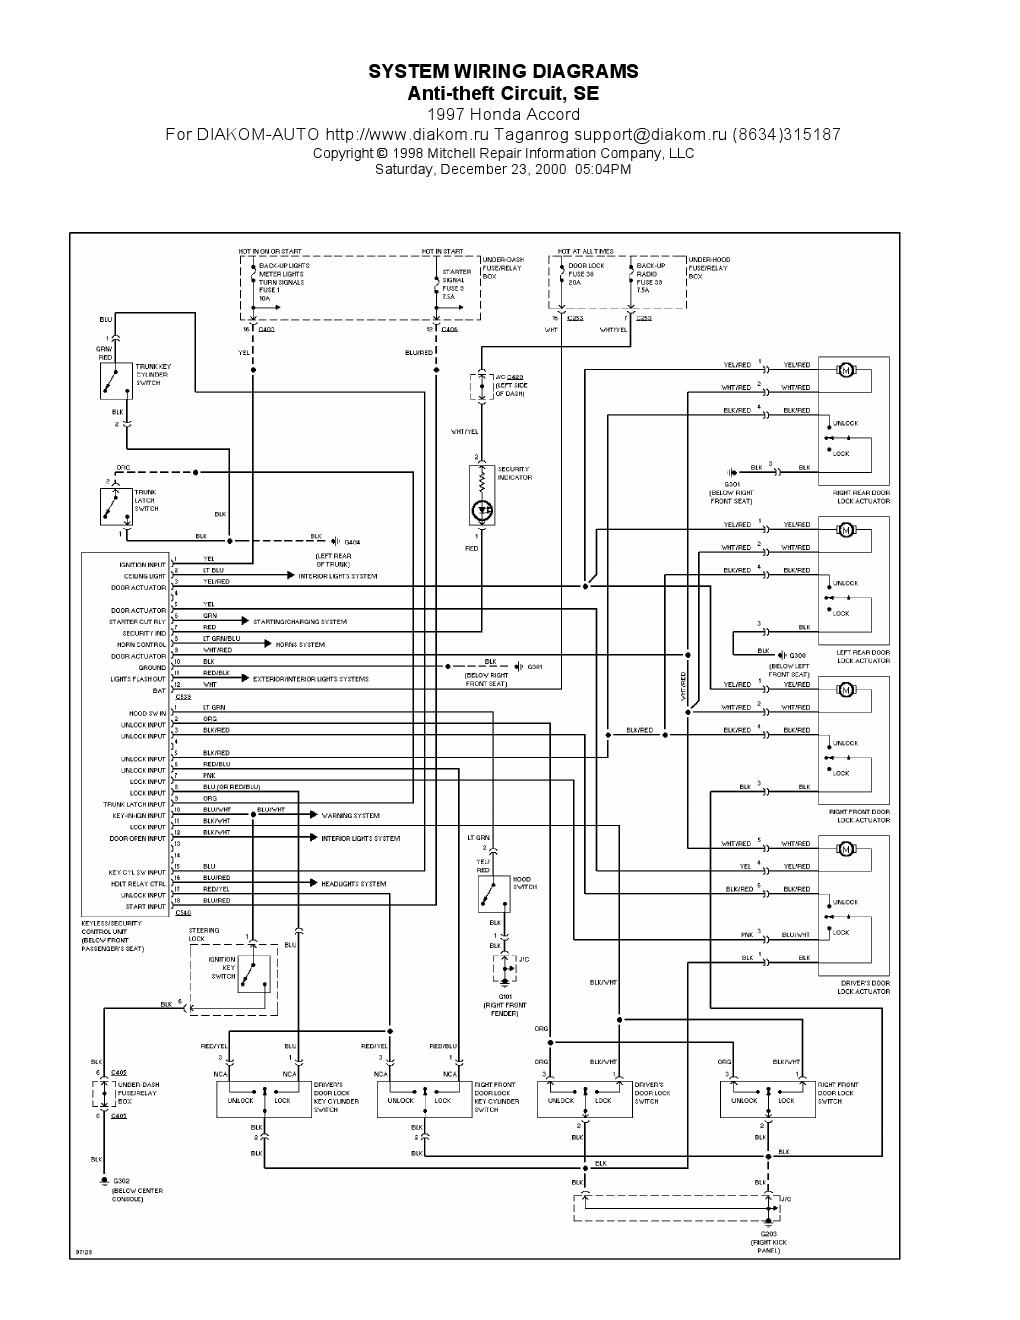 97 Honda Accord Wiring Schematic Electric - General Wiring Diagrams control  - control.leinivbc.it